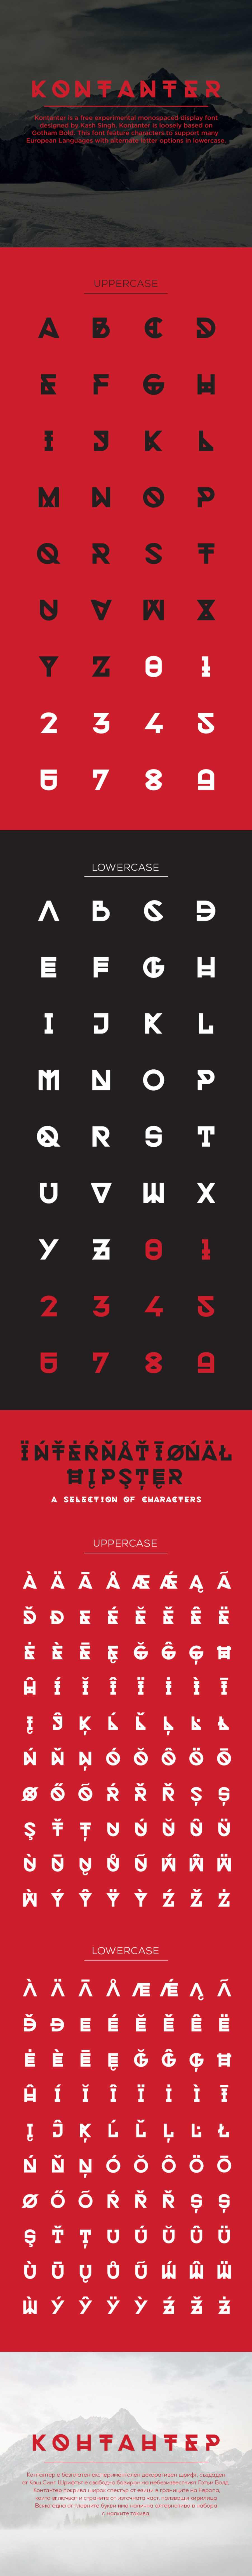 Kontanter free font - Fontfabric